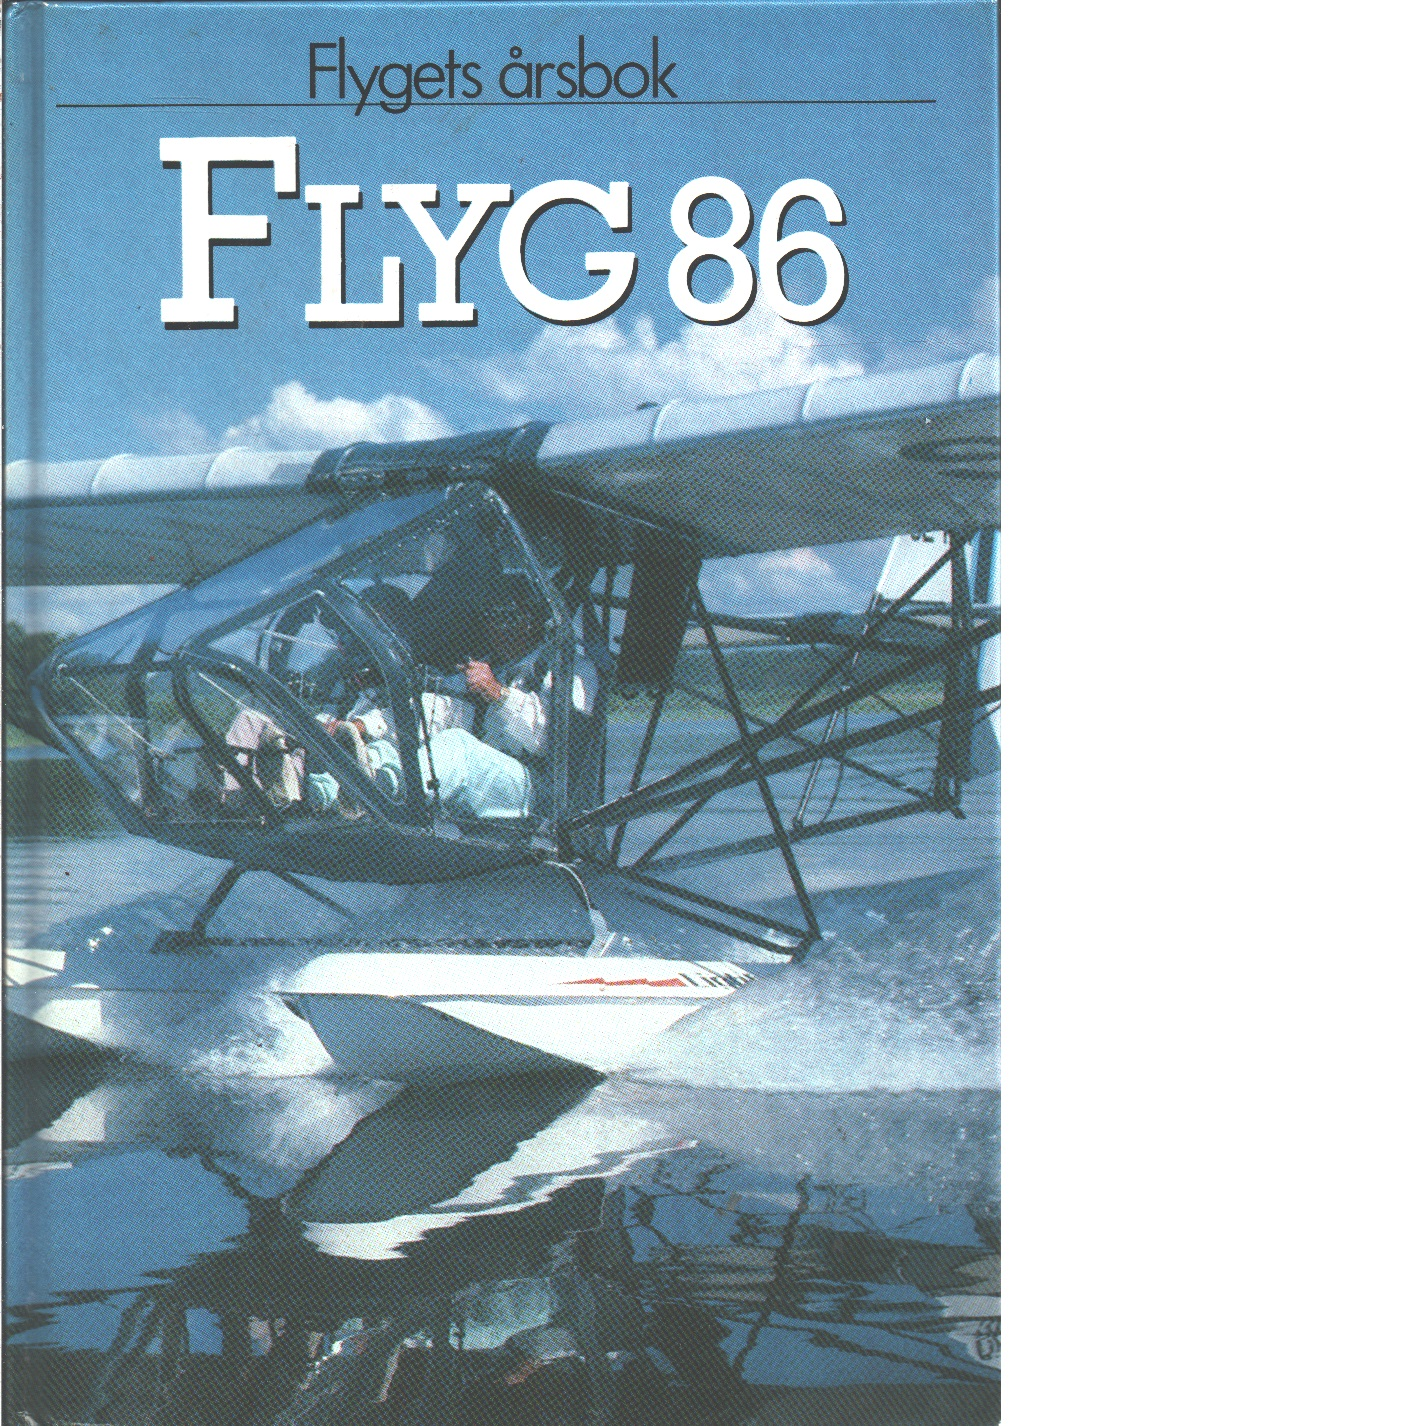 Flyg : flygets årsbok 86 - Kristoffersson, Pej